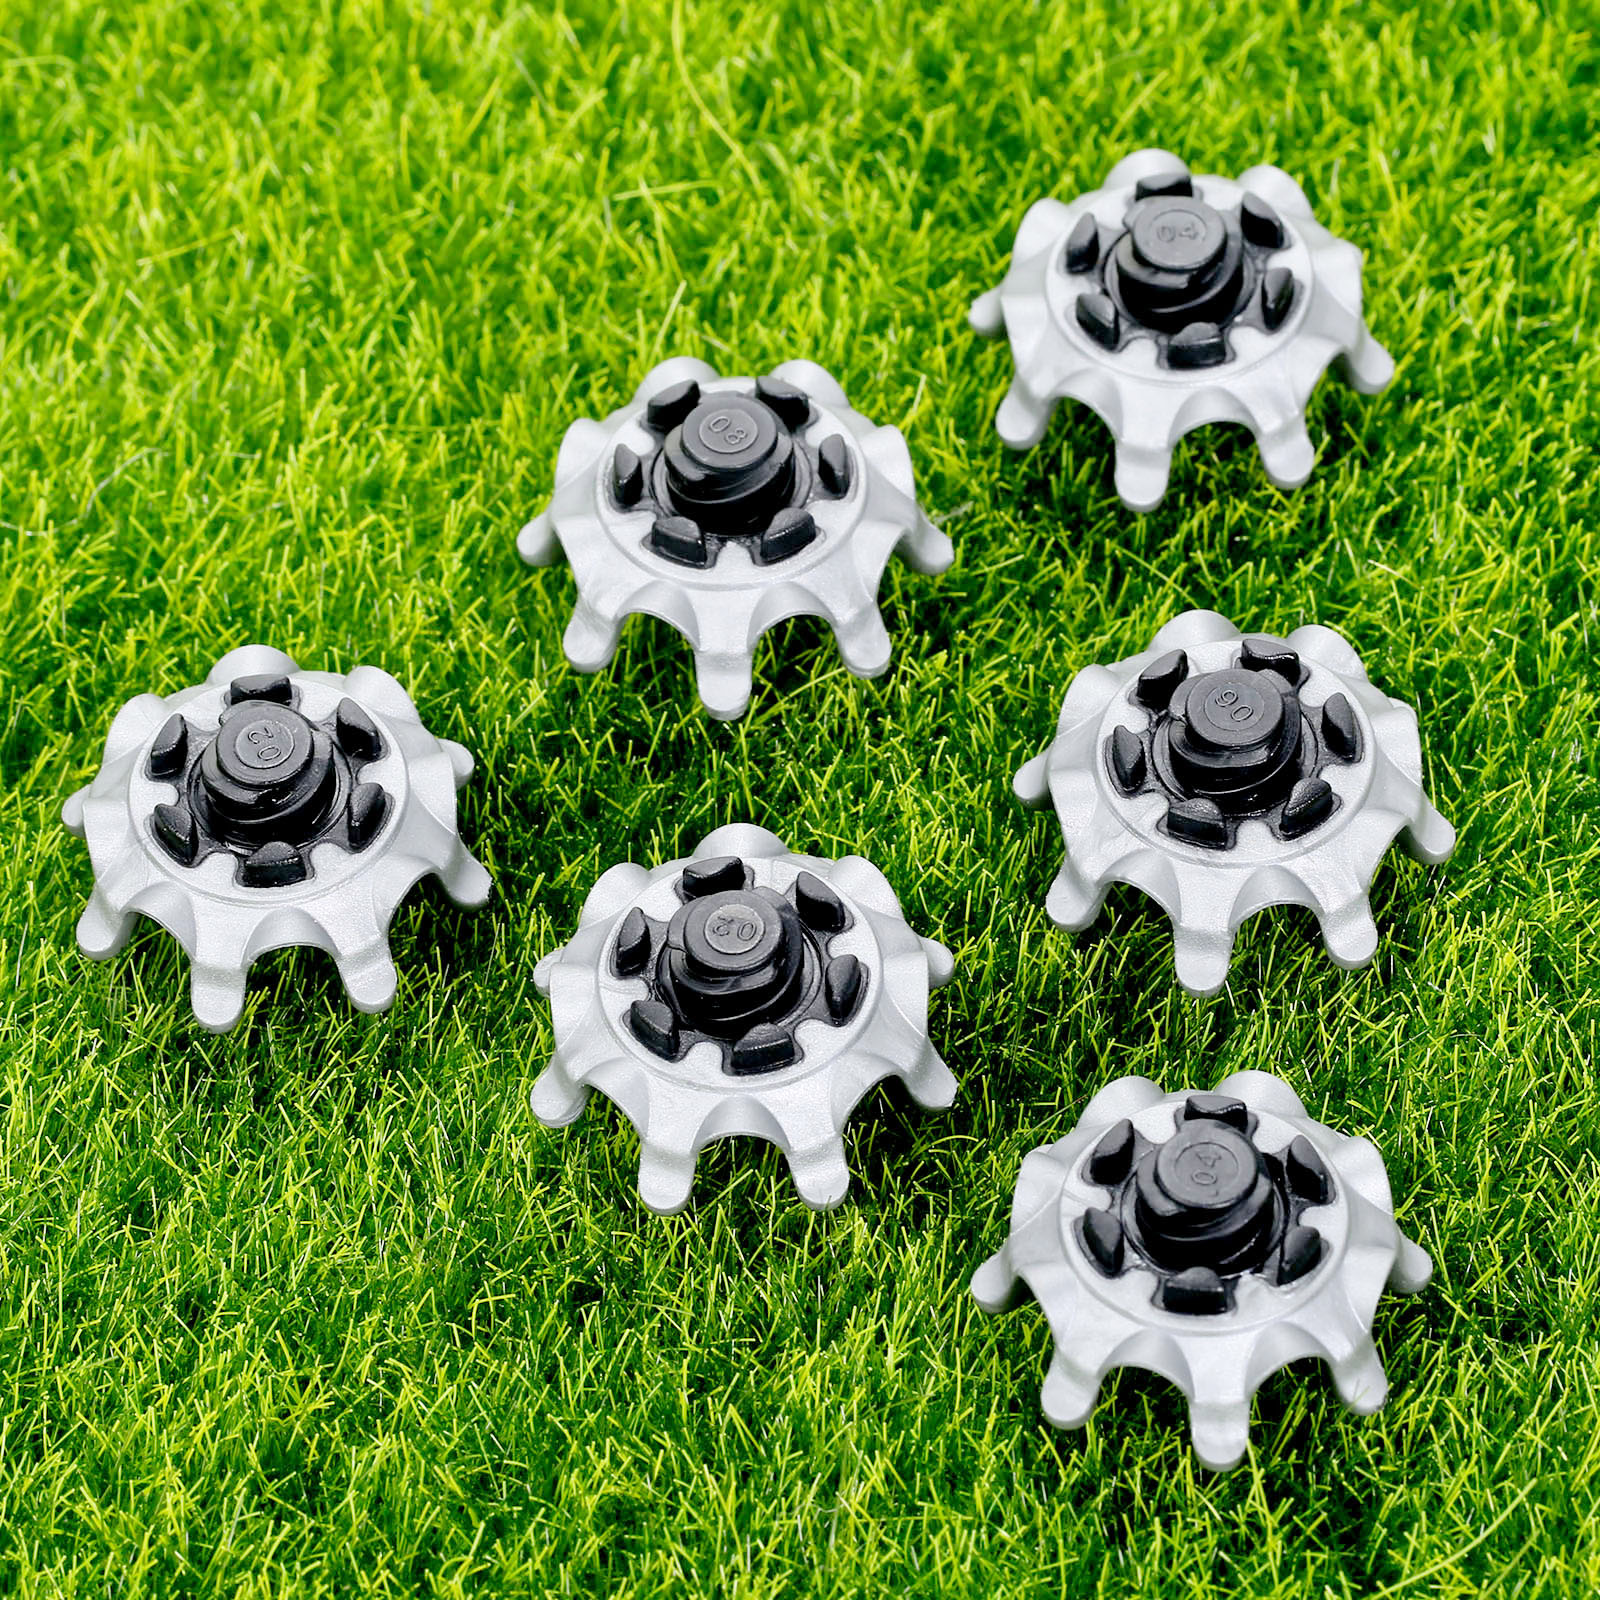 14Pcs TPR Golf Shoe Spikes Replacement Champ Cleats Pins Fast Twist Turn Screw Studs Stinger Golf Accessories Golf Training Aids